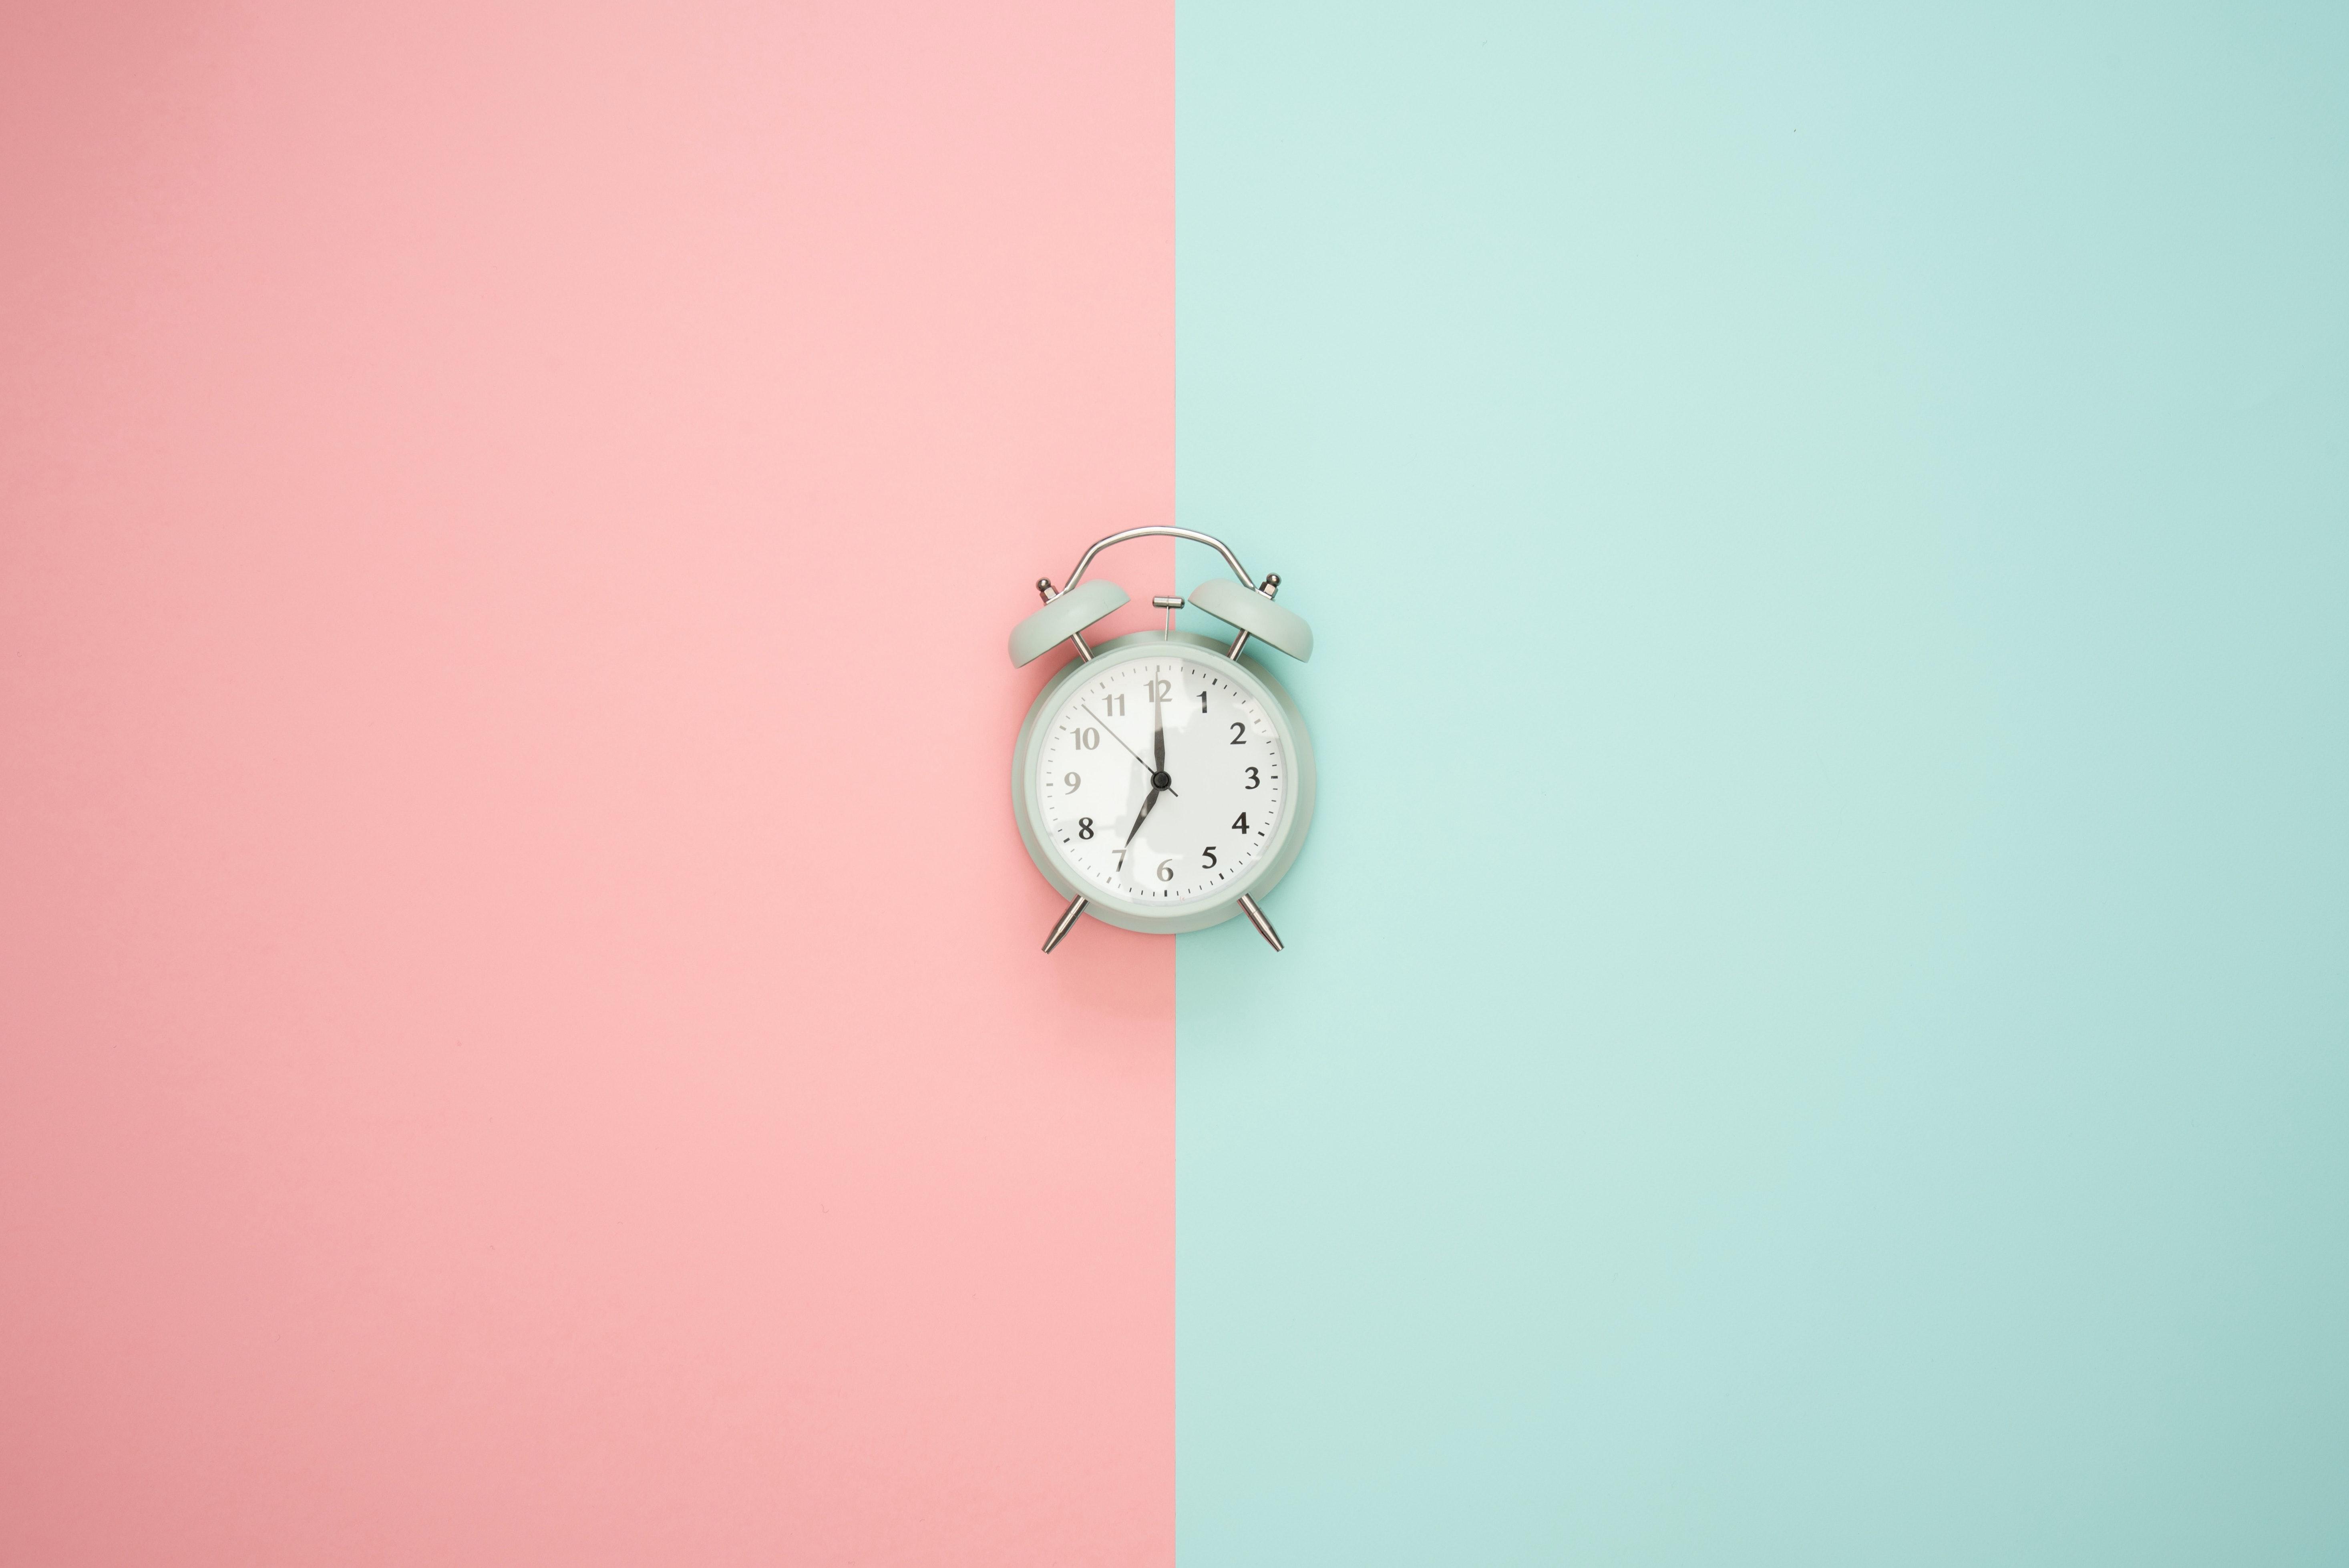 Gray Double-bell Clock · Free Stock Photo